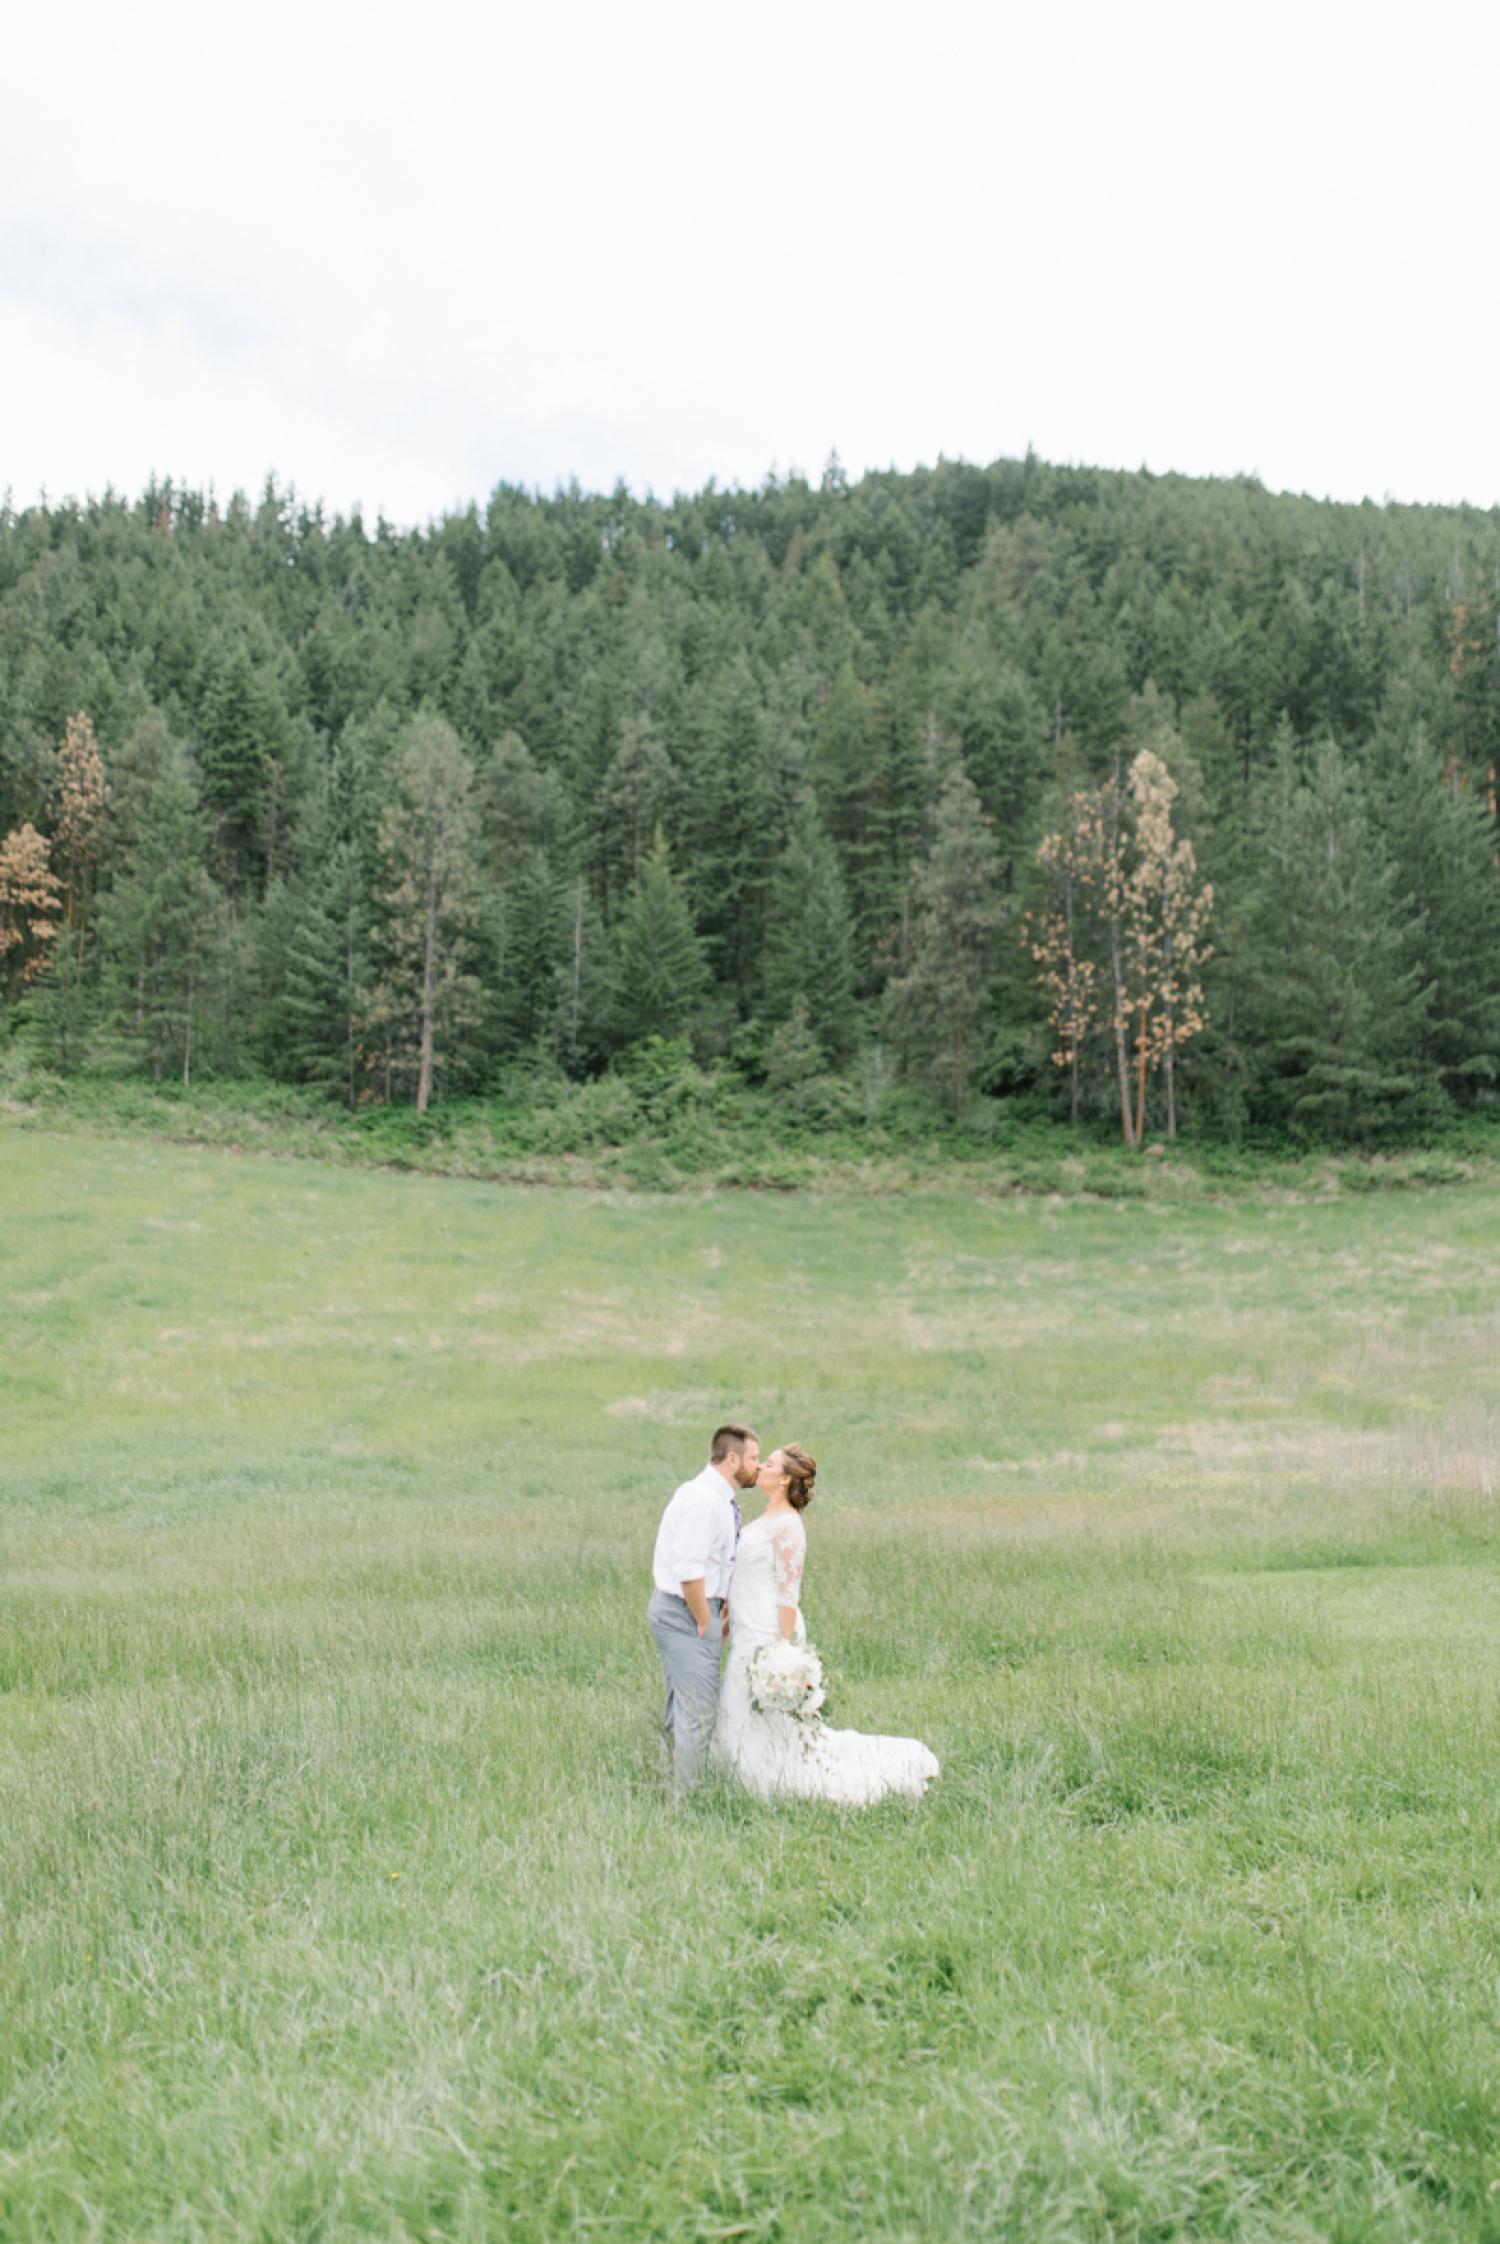 Wenatchee Wedding Photographer   Hampton Hideaway   Summer Rustic Wedding Eastern Washington   Emma Rose Company   Pastel Wedding Inspiration   Lace Wedding   Pacific Northwest Wedding 38.jpg